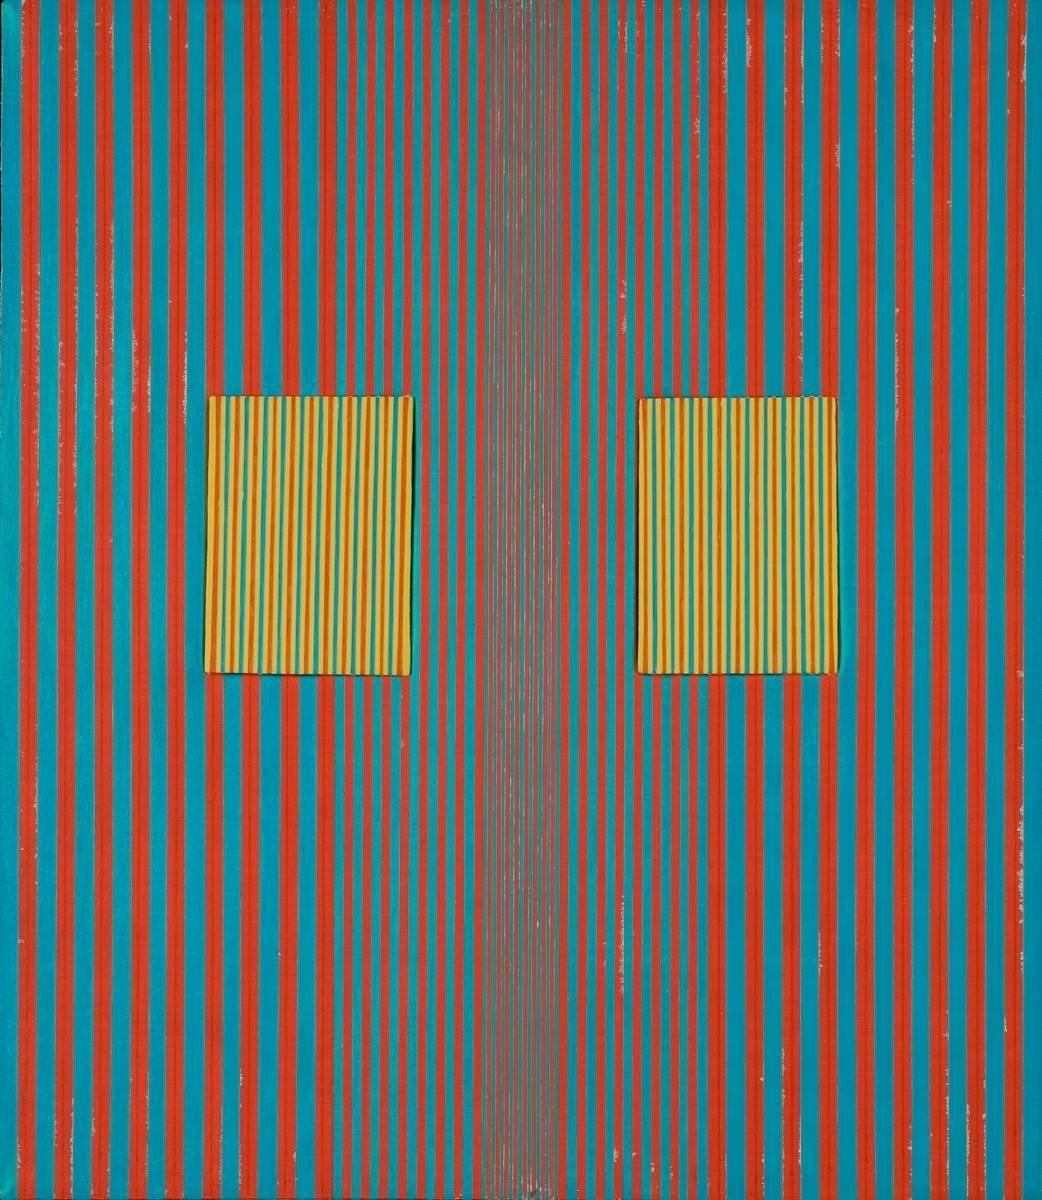 Ken Weathersby, 149, 2006, Acrylic Paint